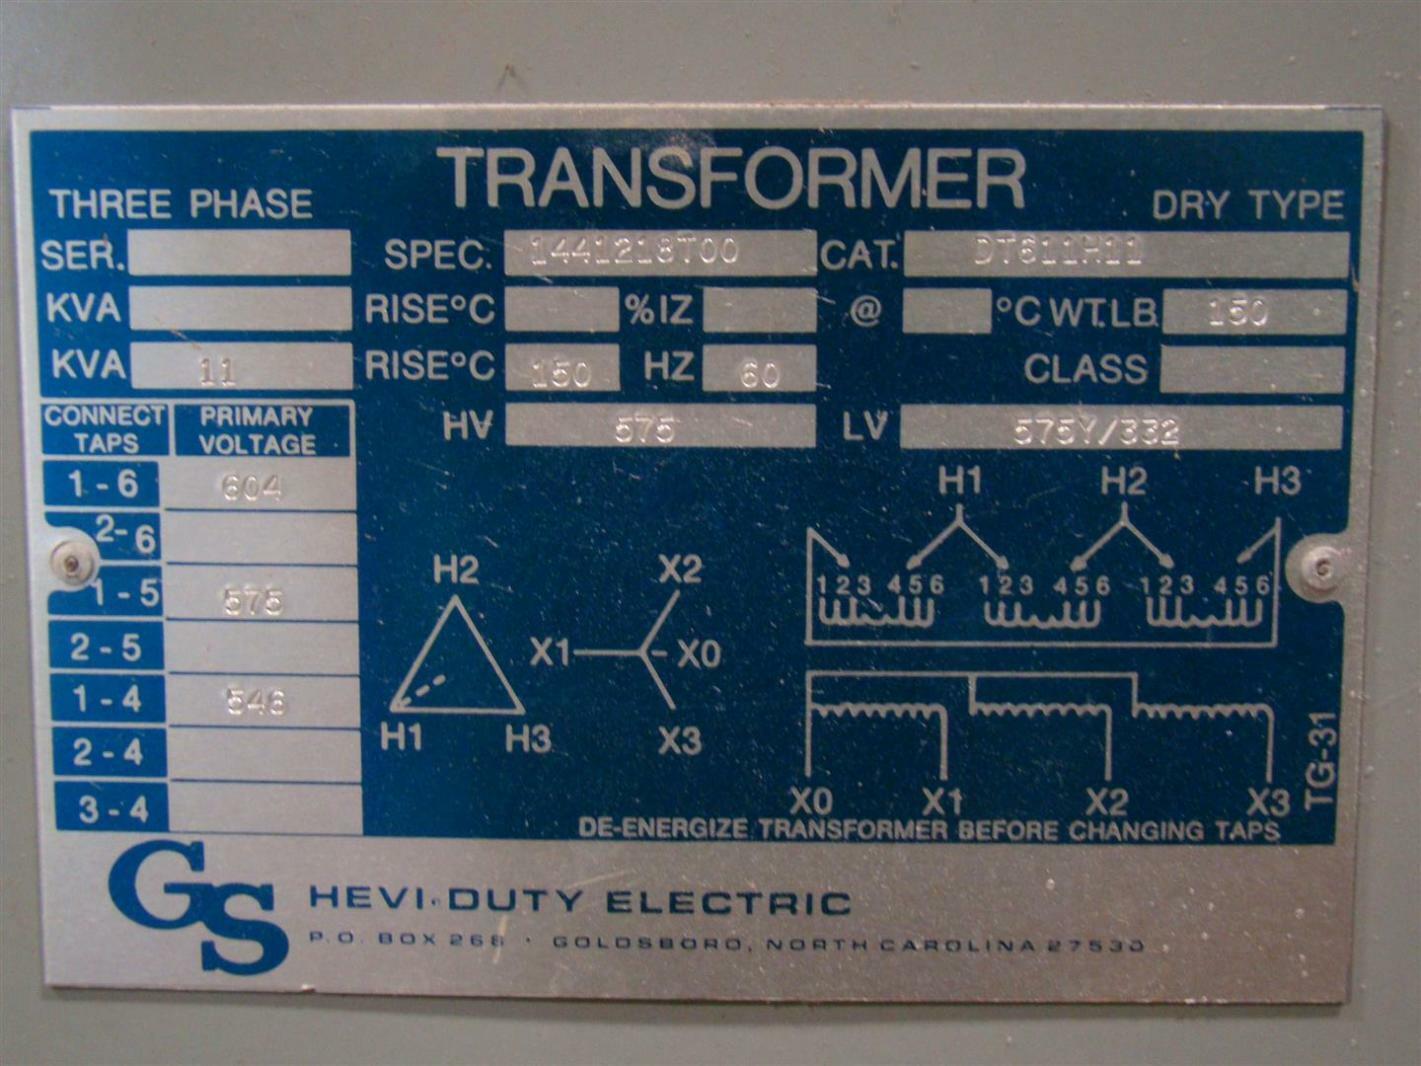 Sola Hevi Duty 3 Phase 11 Kva Transformer 575x575y 332 Volt Dt611h11